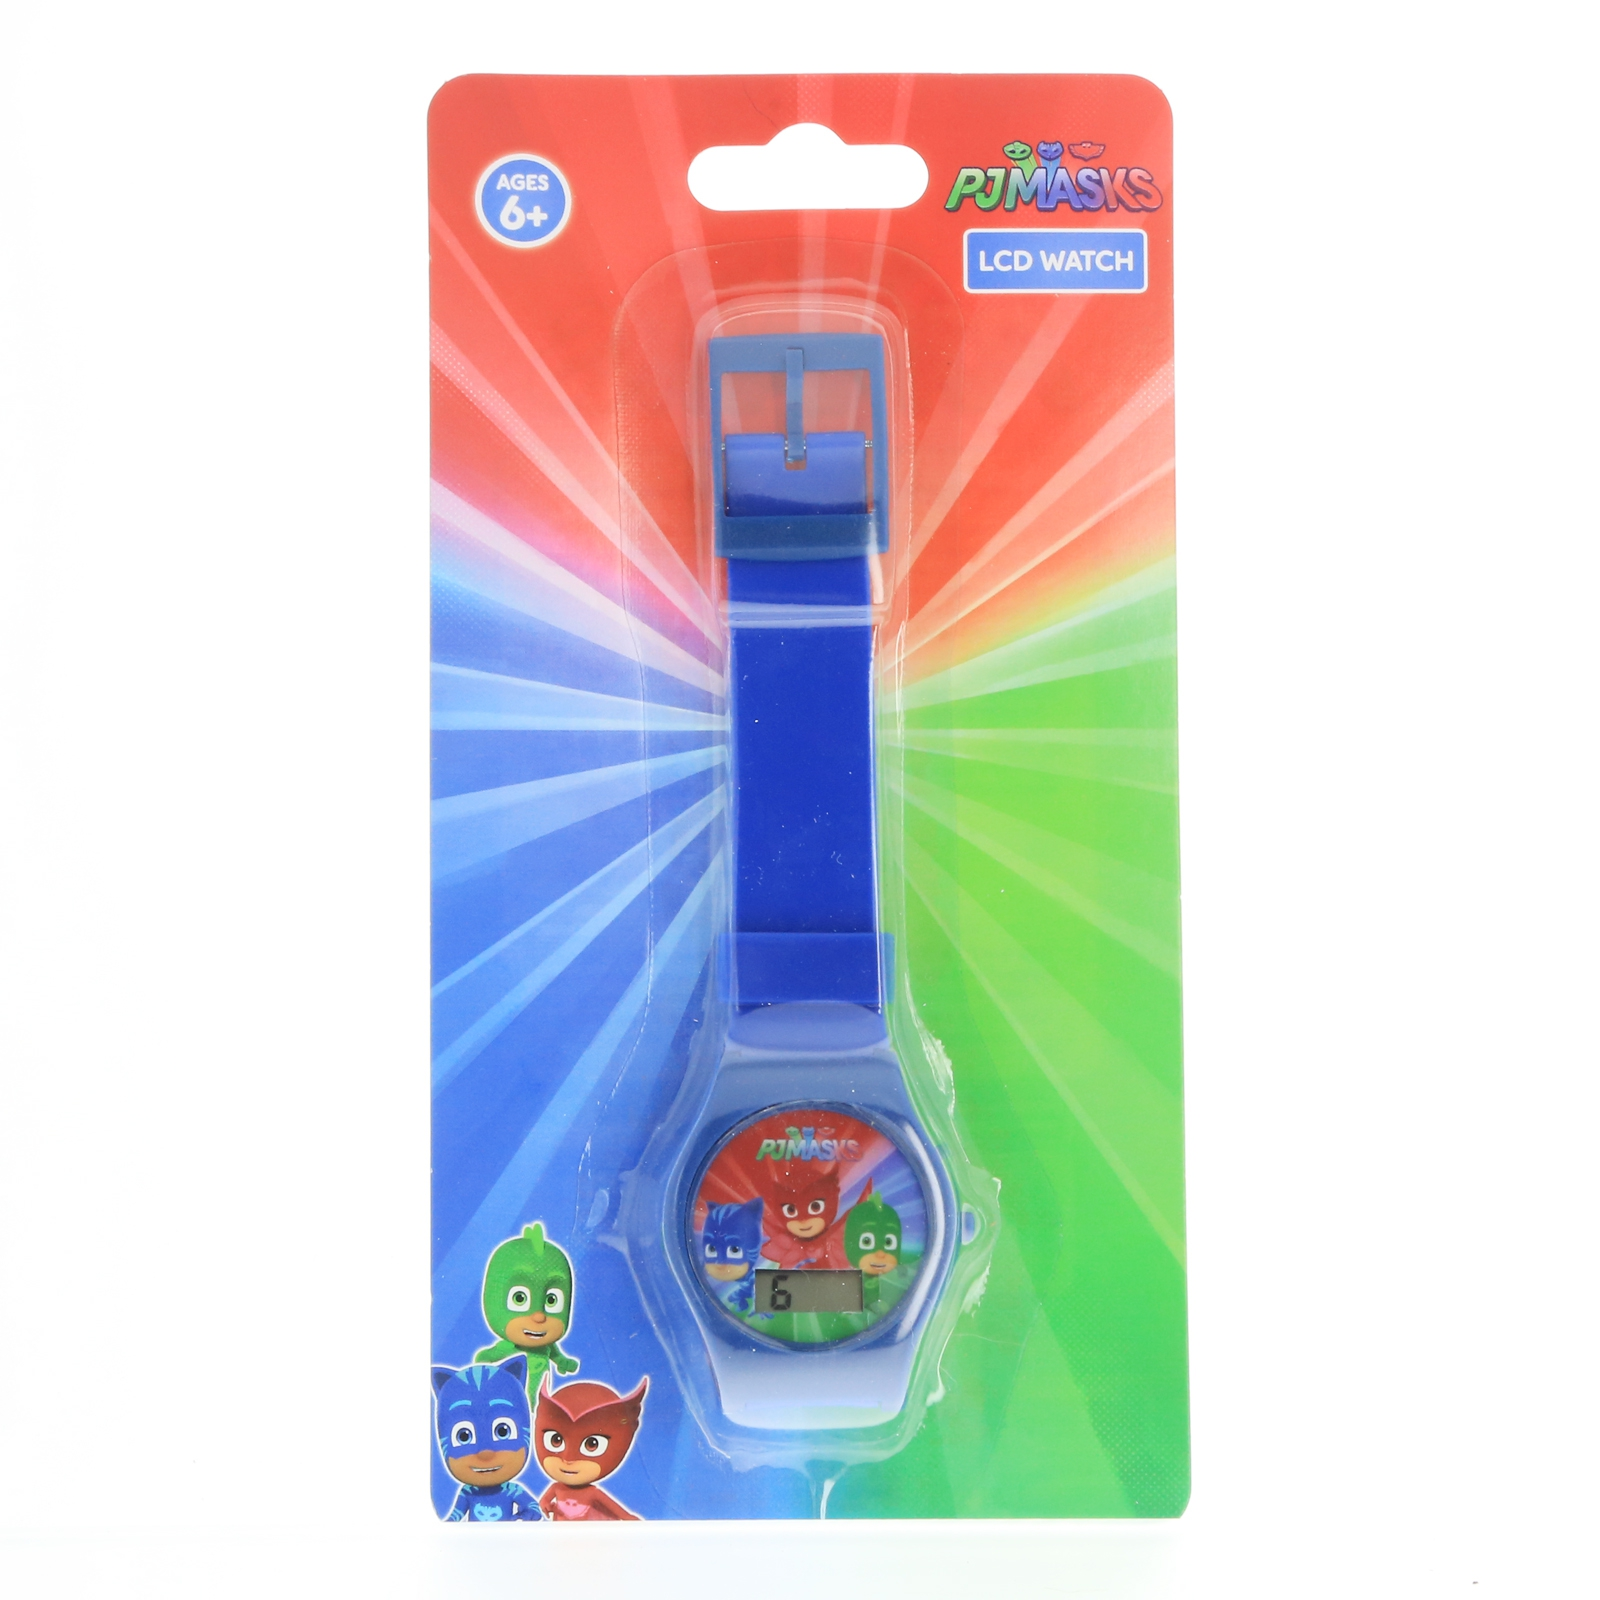 PJ Masks Boys LCD Wrist Watch Digital Style Adjustable Strap - Blue